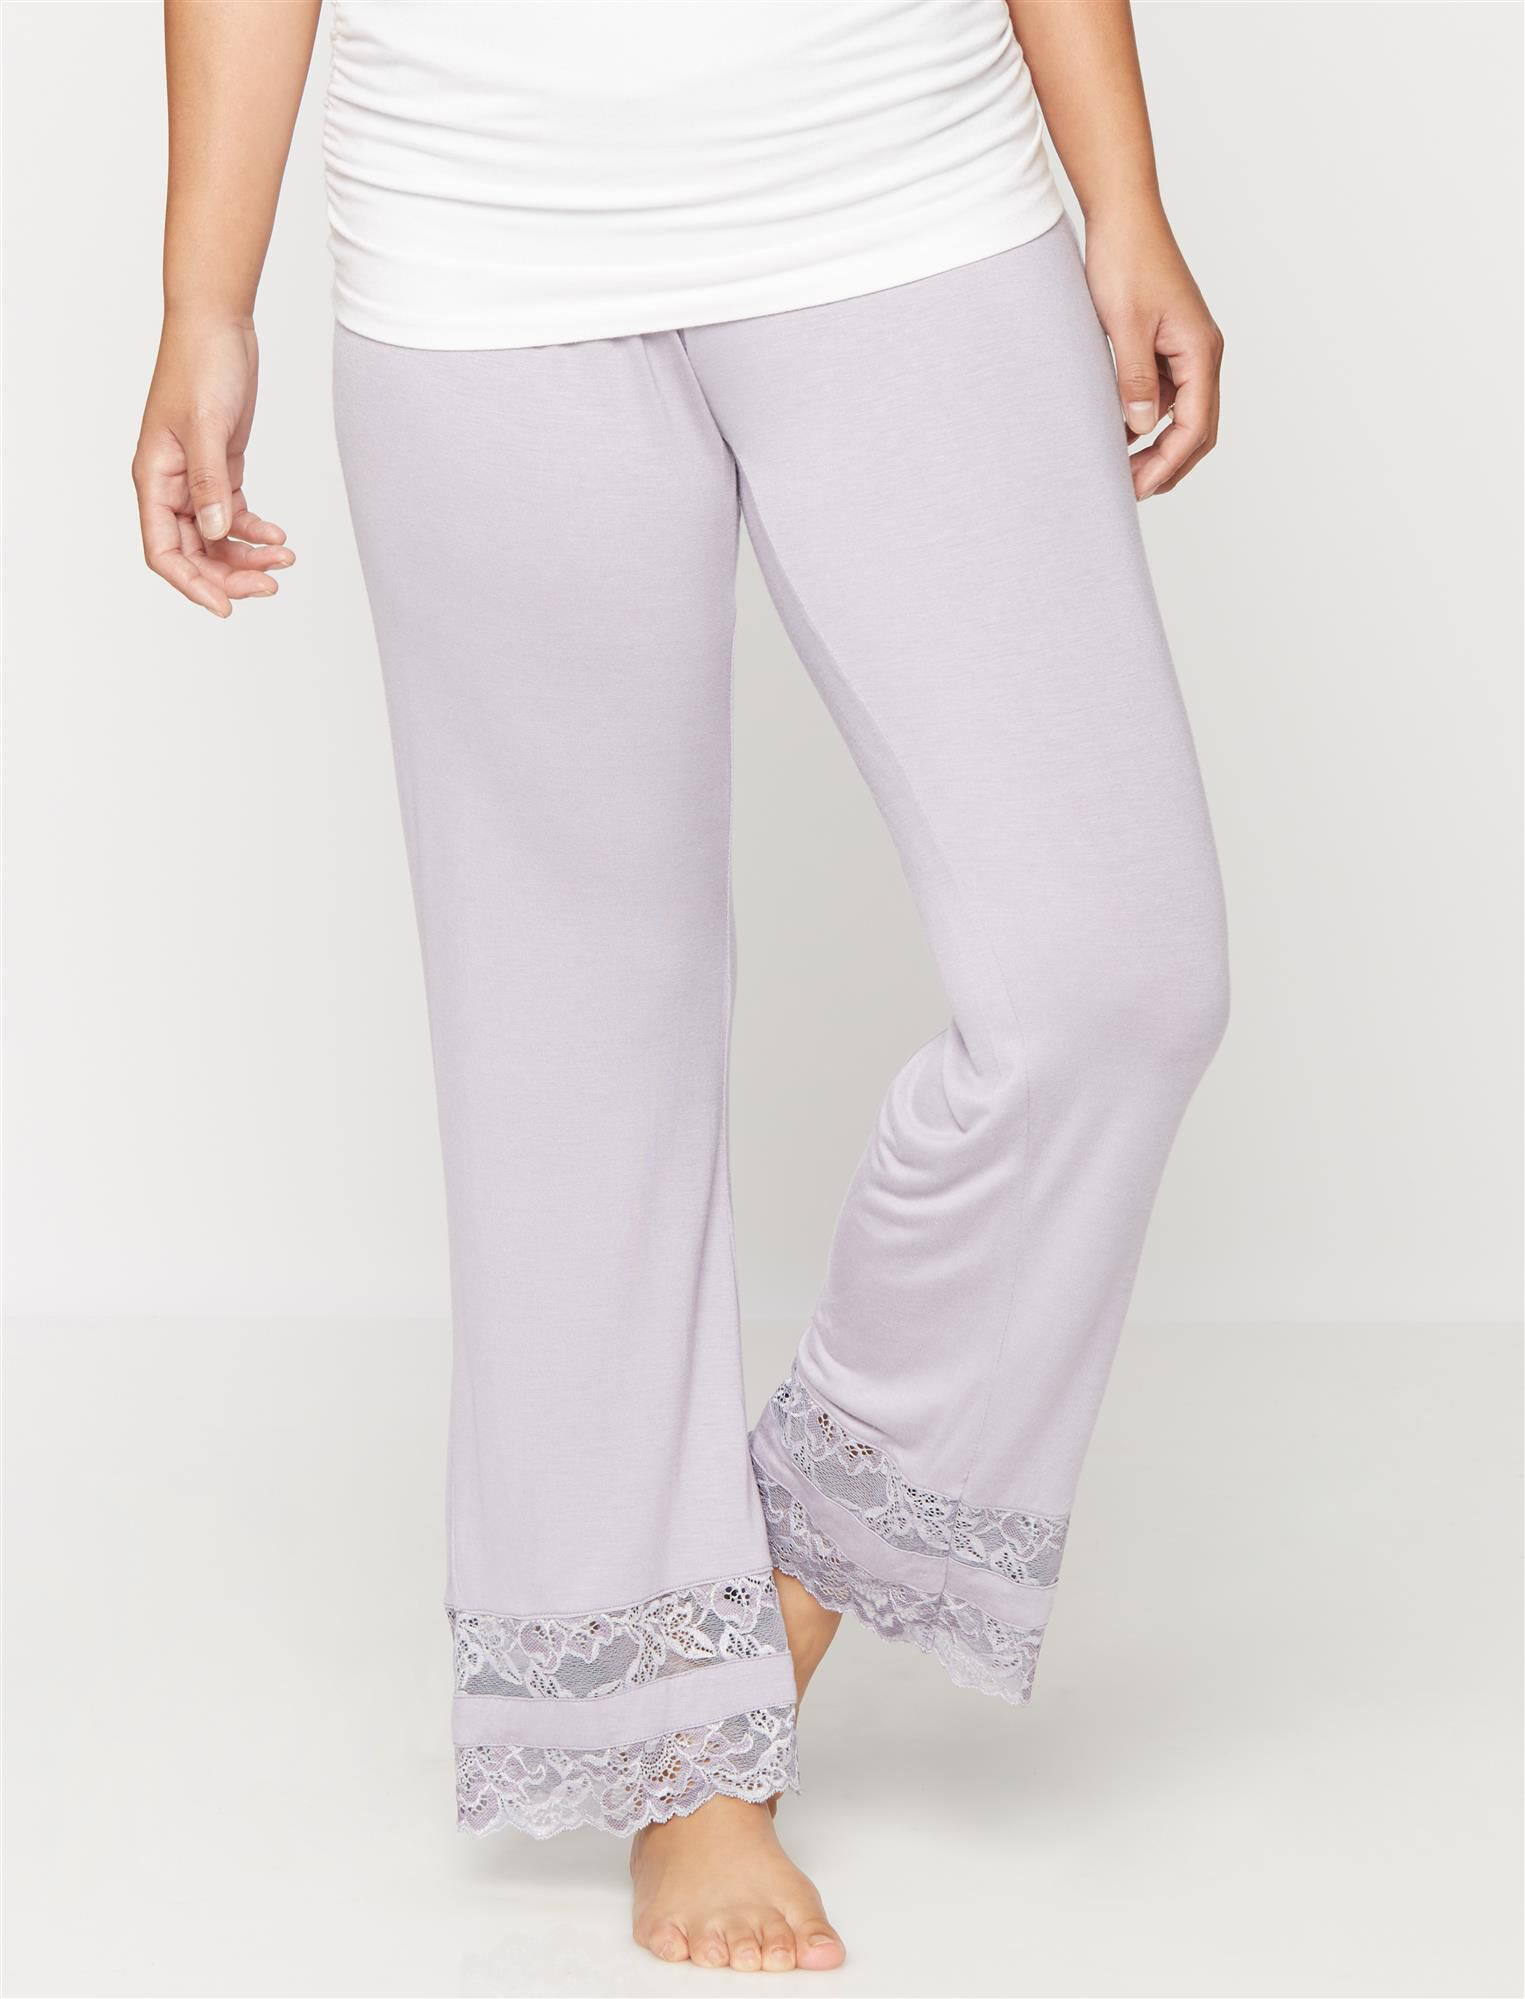 Lace Trim Maternity Sleep Pants- Lavender